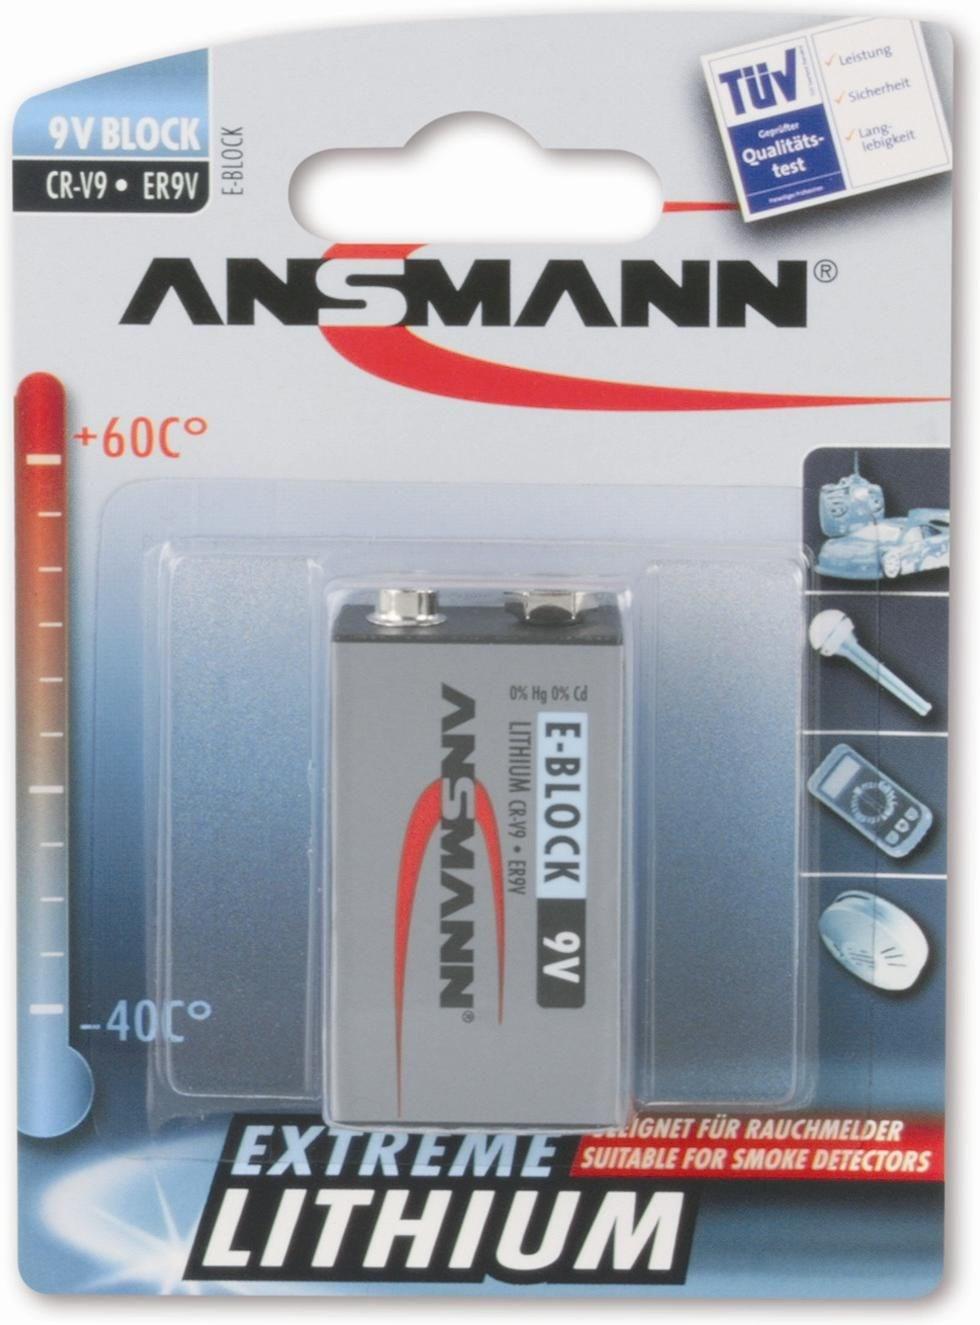 ansmann extreme lithium 9v block akkus batterien. Black Bedroom Furniture Sets. Home Design Ideas